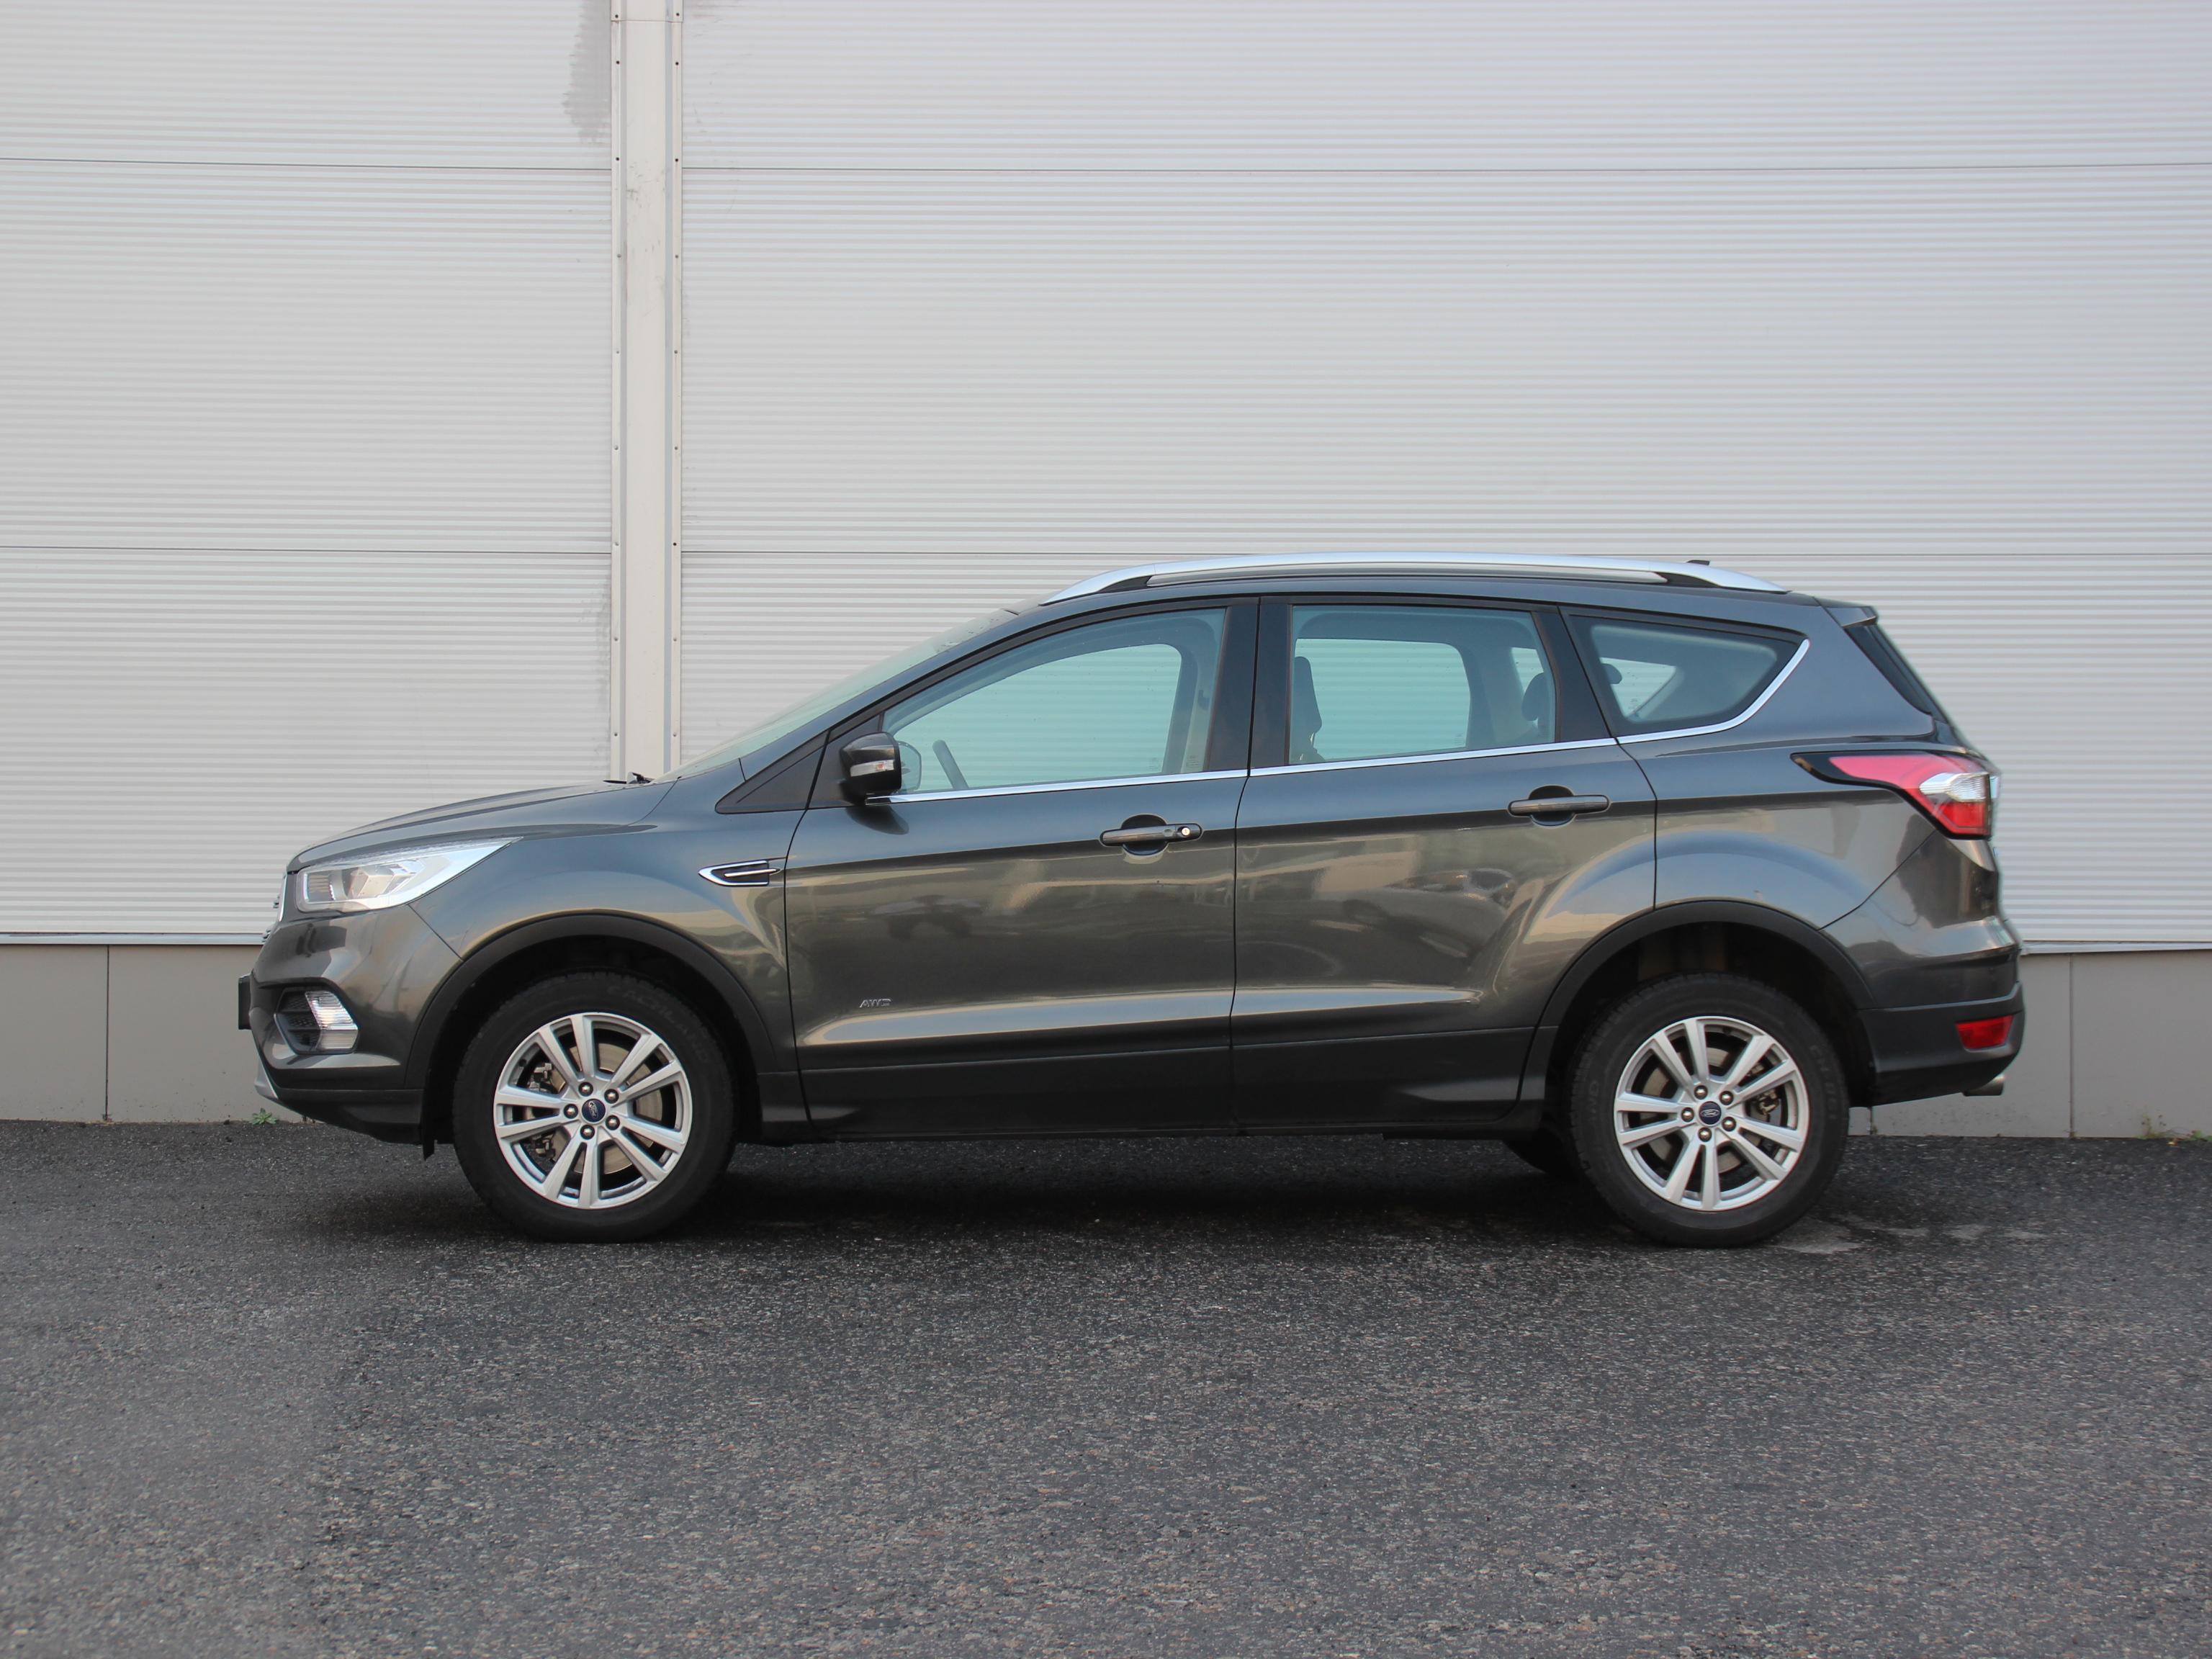 Ford Kuga Внедорожник (2018г.)